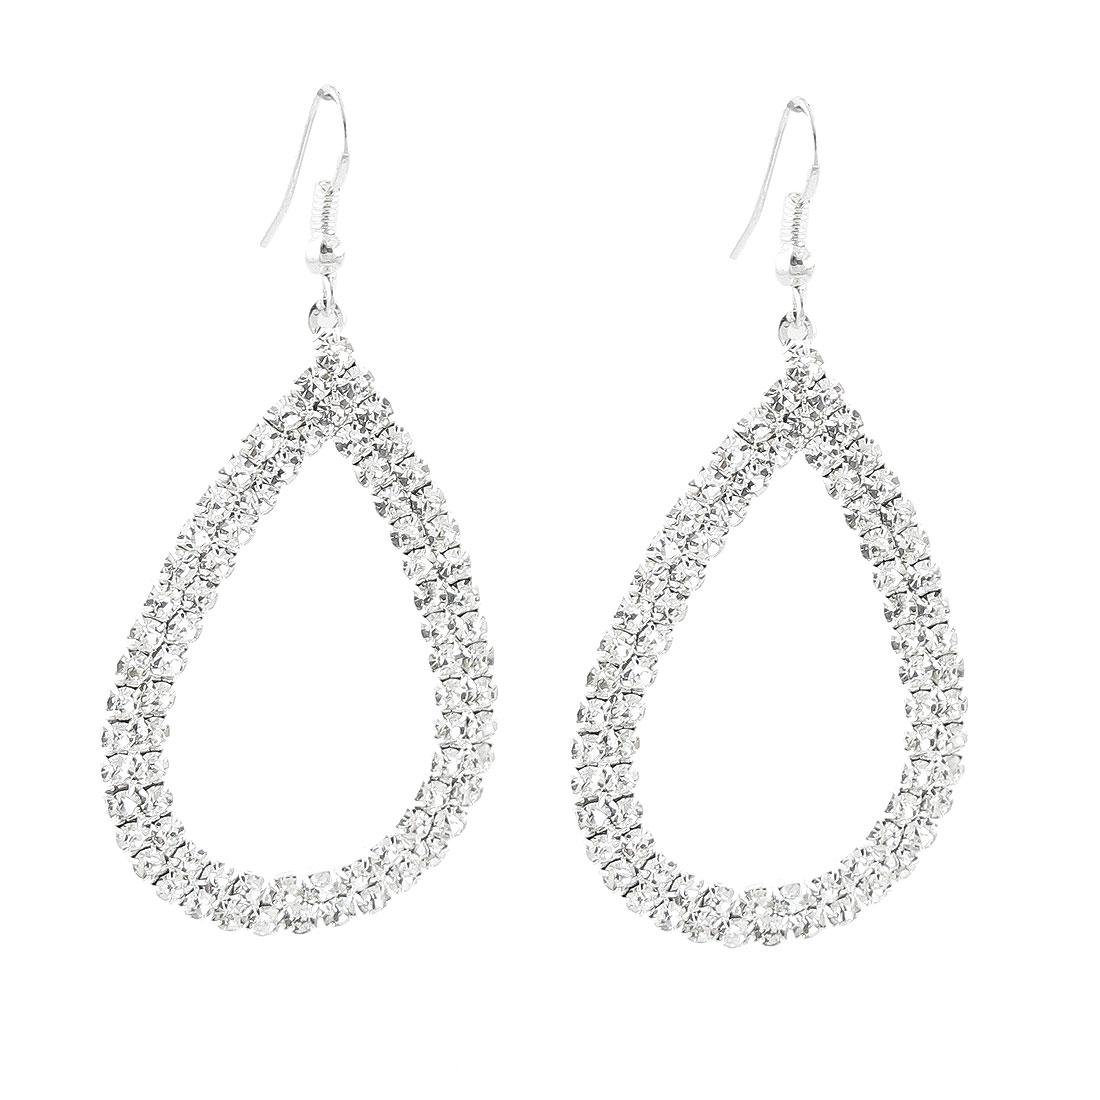 Pair Silver Tone Rhinestones Inlaid Raindrop Pendant Hook Earrings for Lady